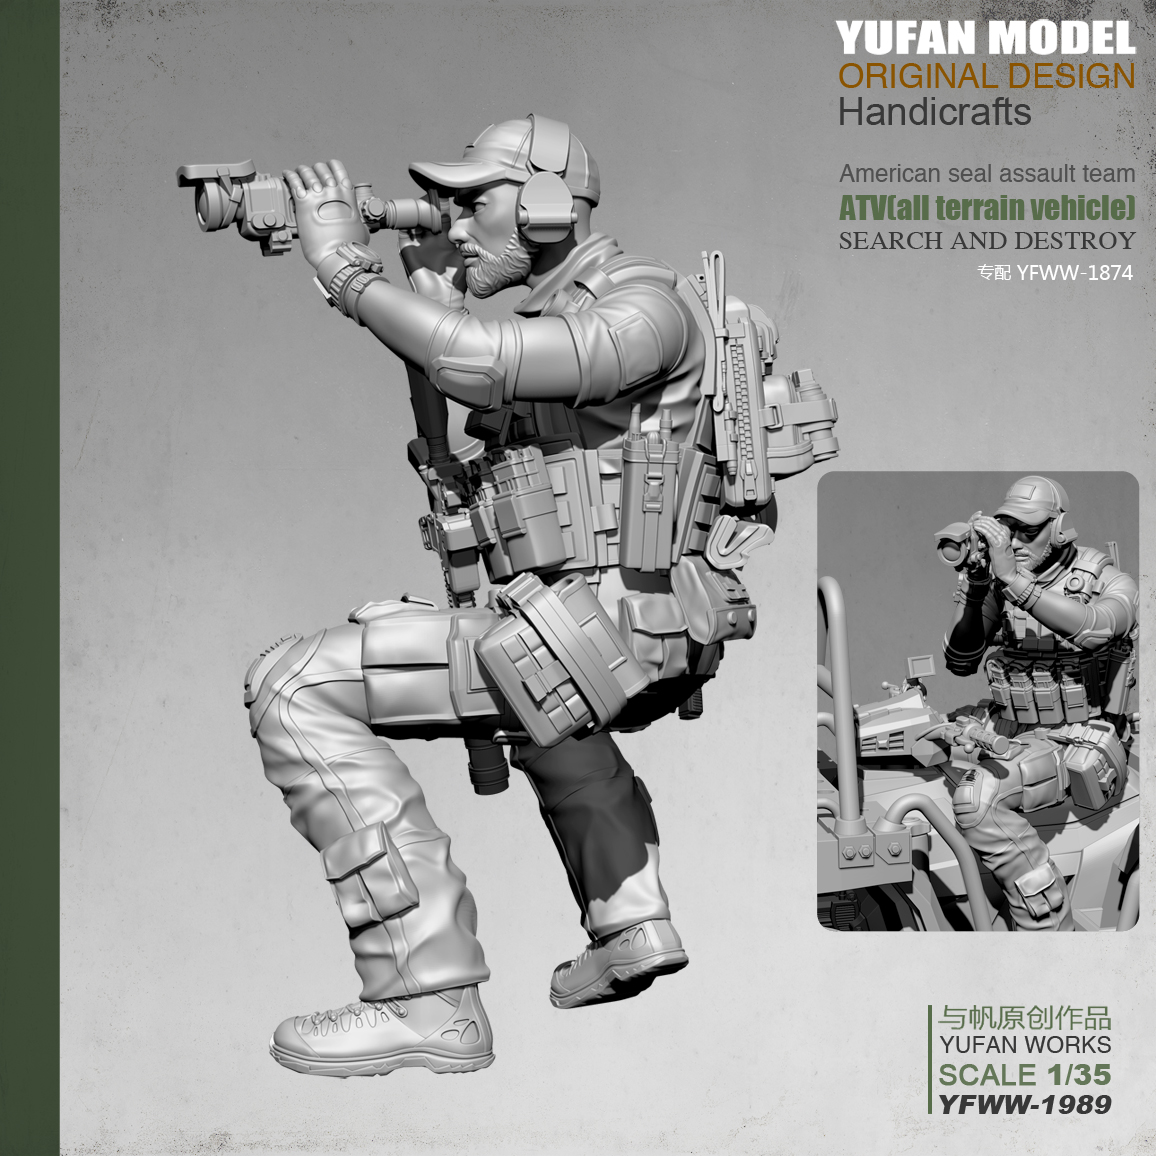 Yufan Model1/35  Resin Figure Us Sniper Observer Vehicle Version Resin Soldier Unmounted Yfww-1989